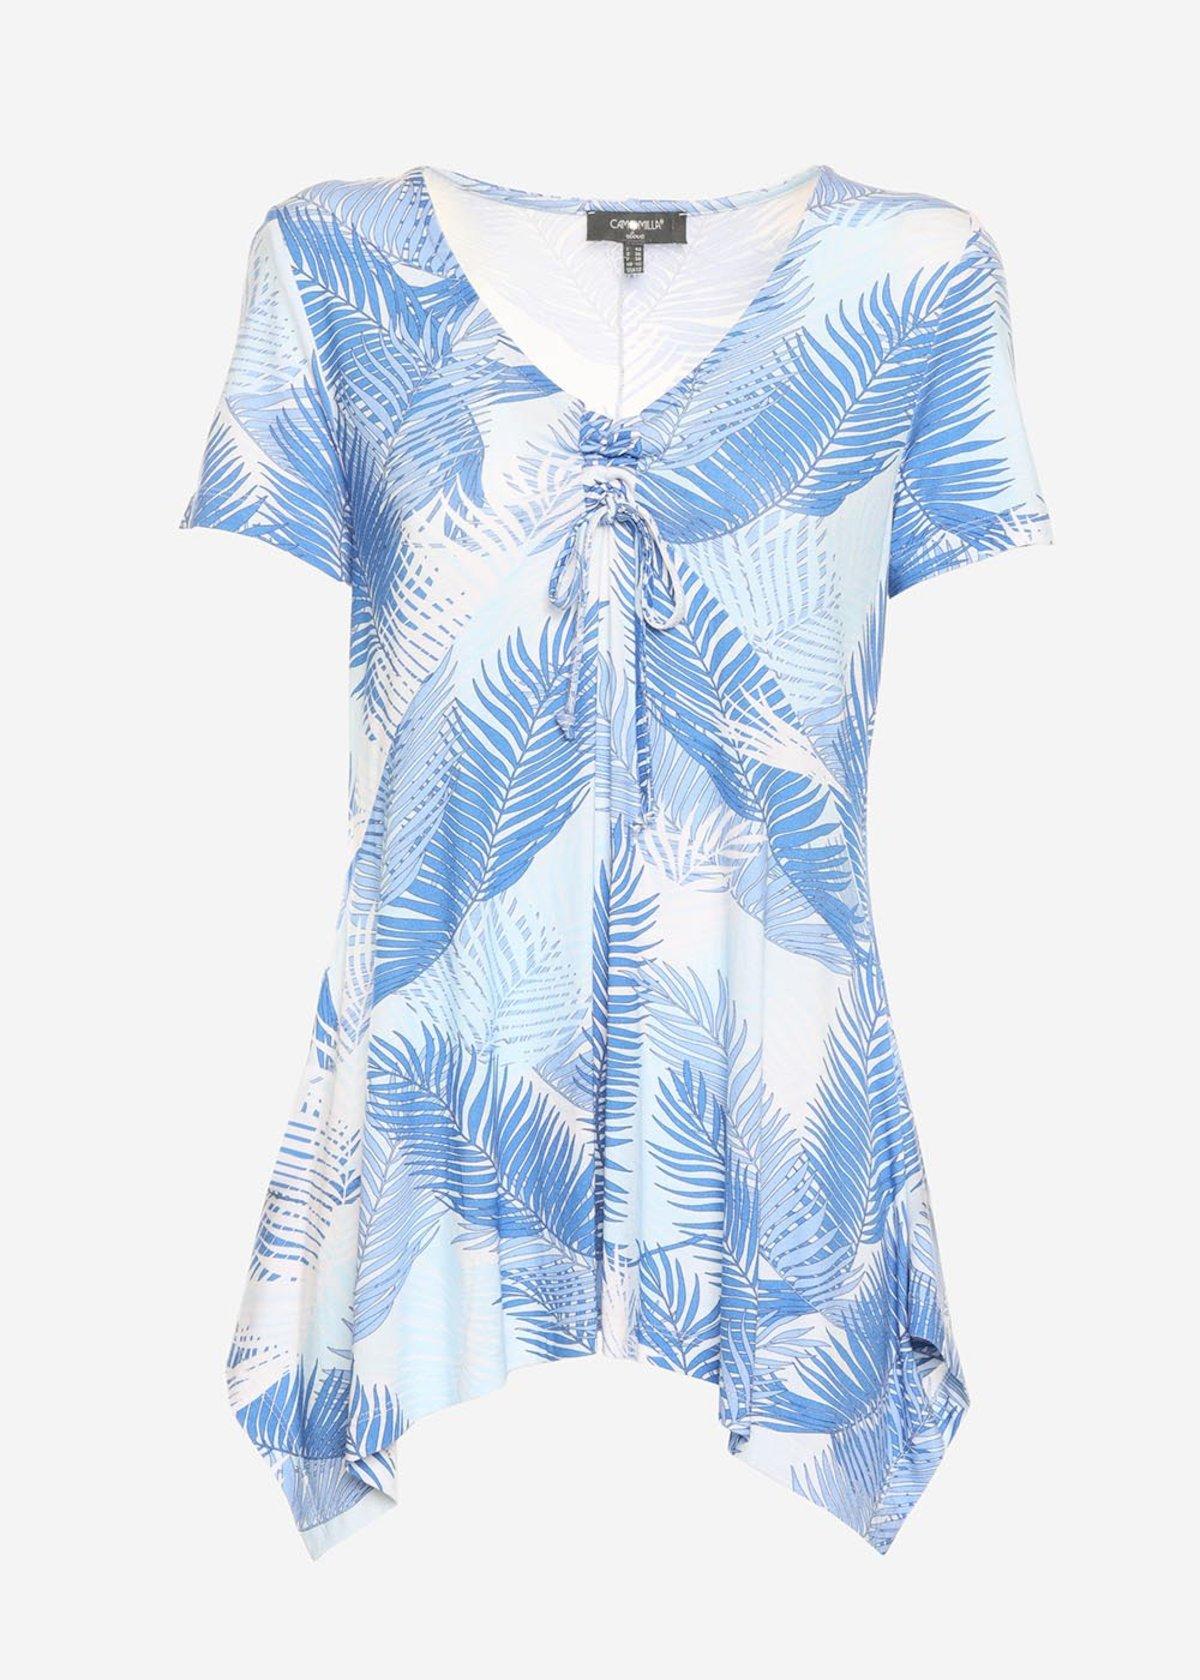 Simmy front bow lacing patterned t-shirt - Formentera / Morning Fantasia